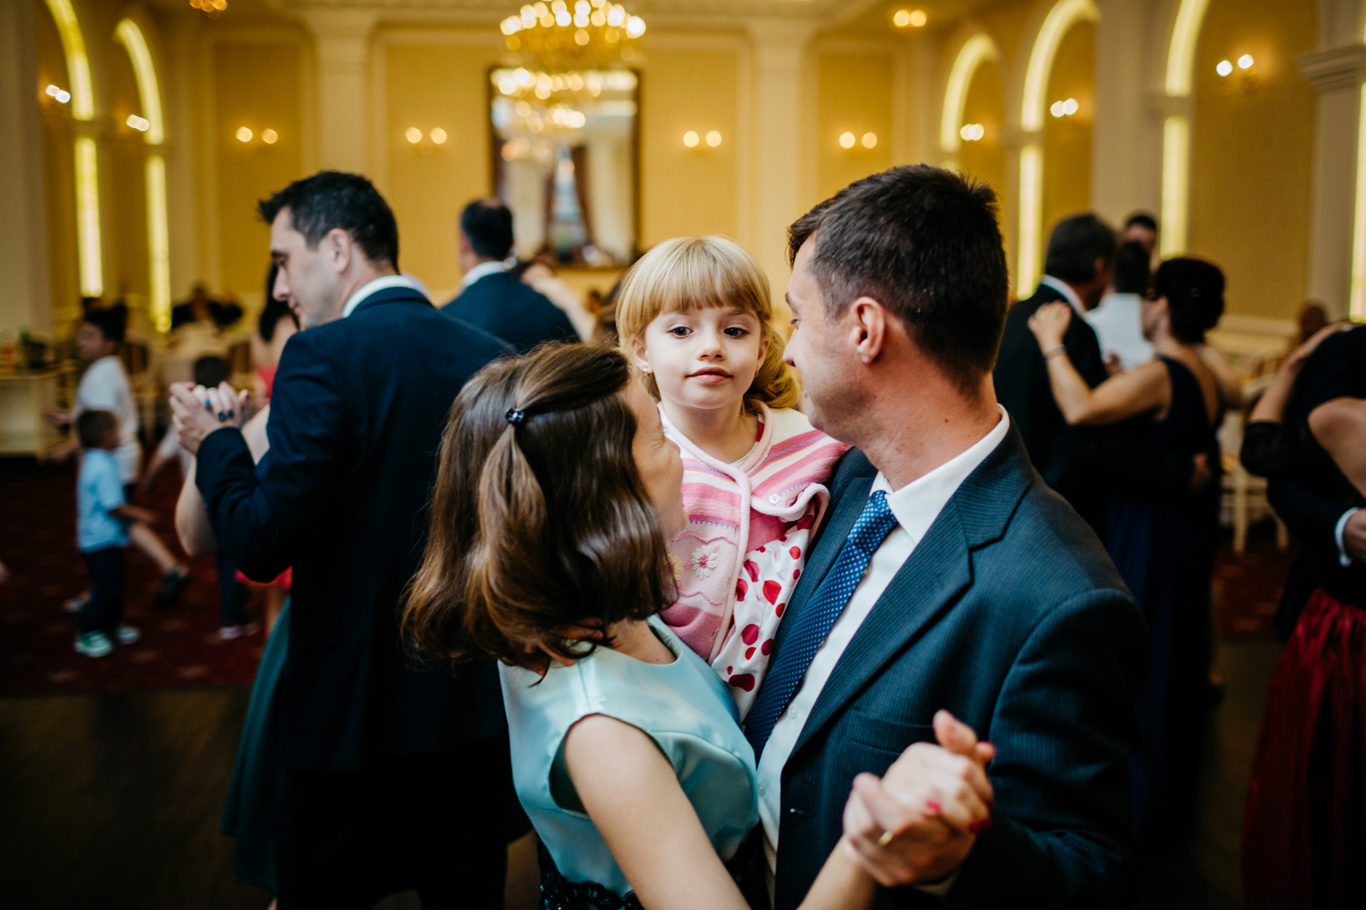 0565-fotografie-nunta-bucuresti-anca-george-fotograf-ciprian-dumitrescu-dcf_5508